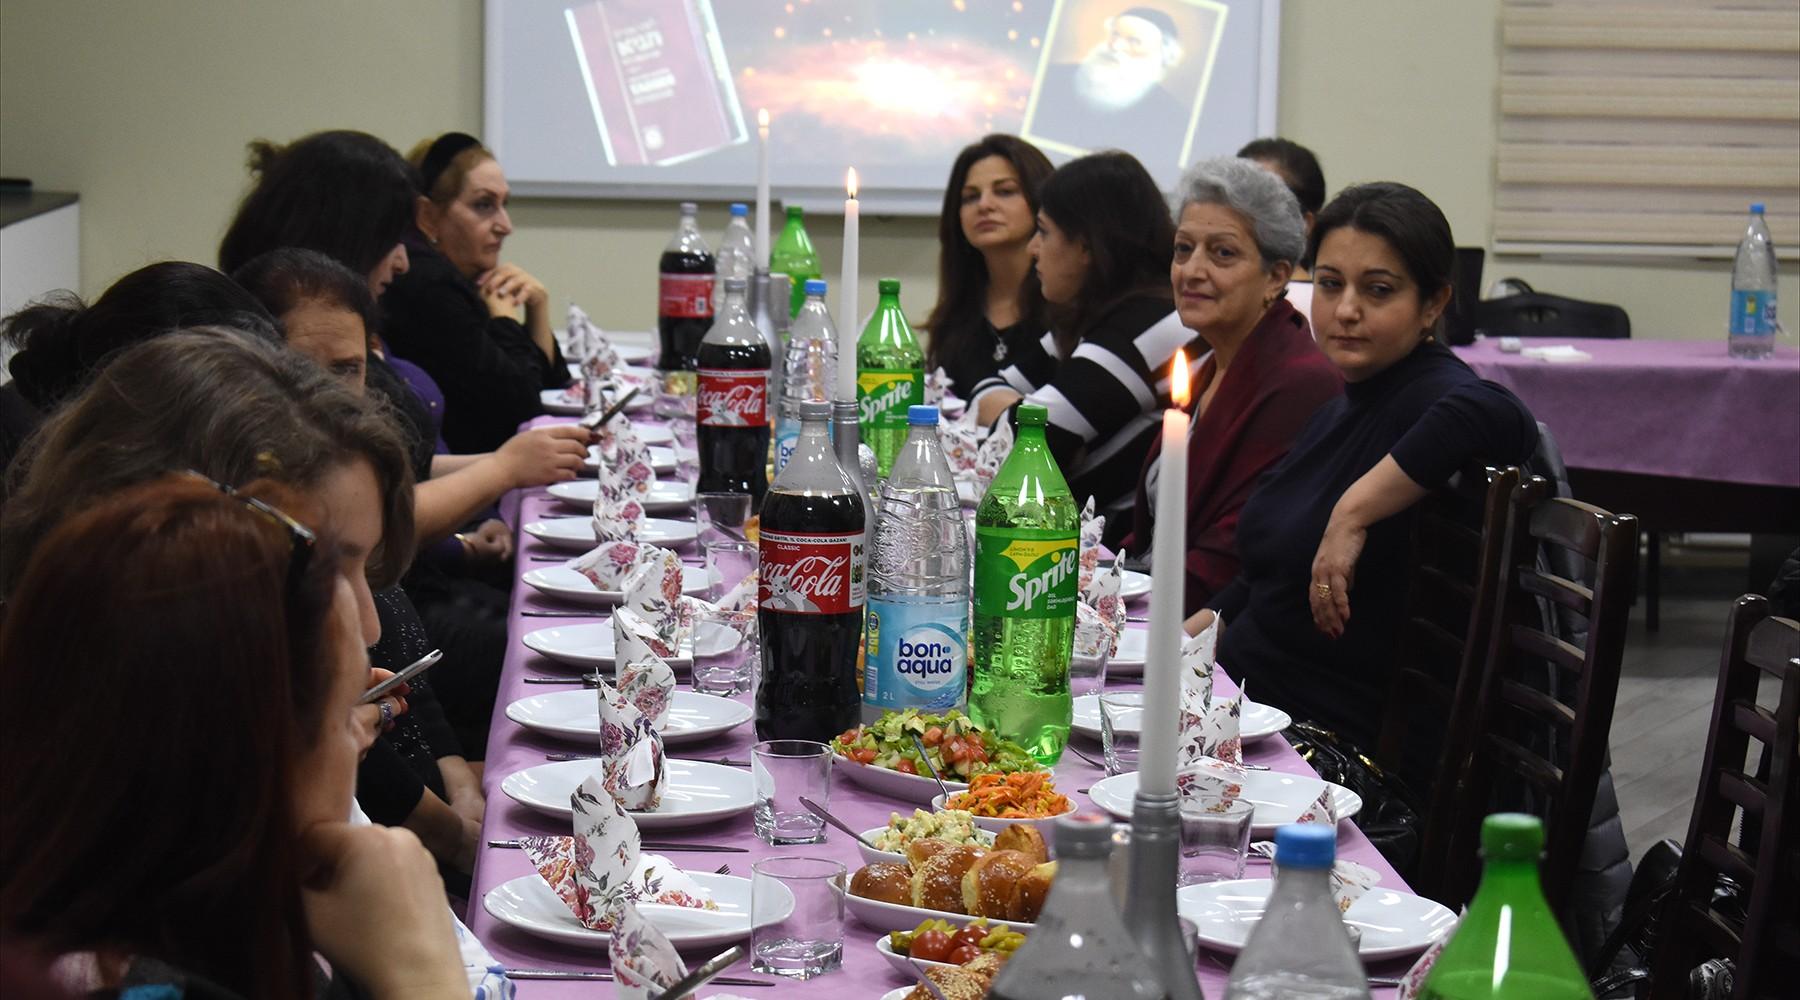 Azerbaijan's Jews postpone public Purim events in deference to national memorial day